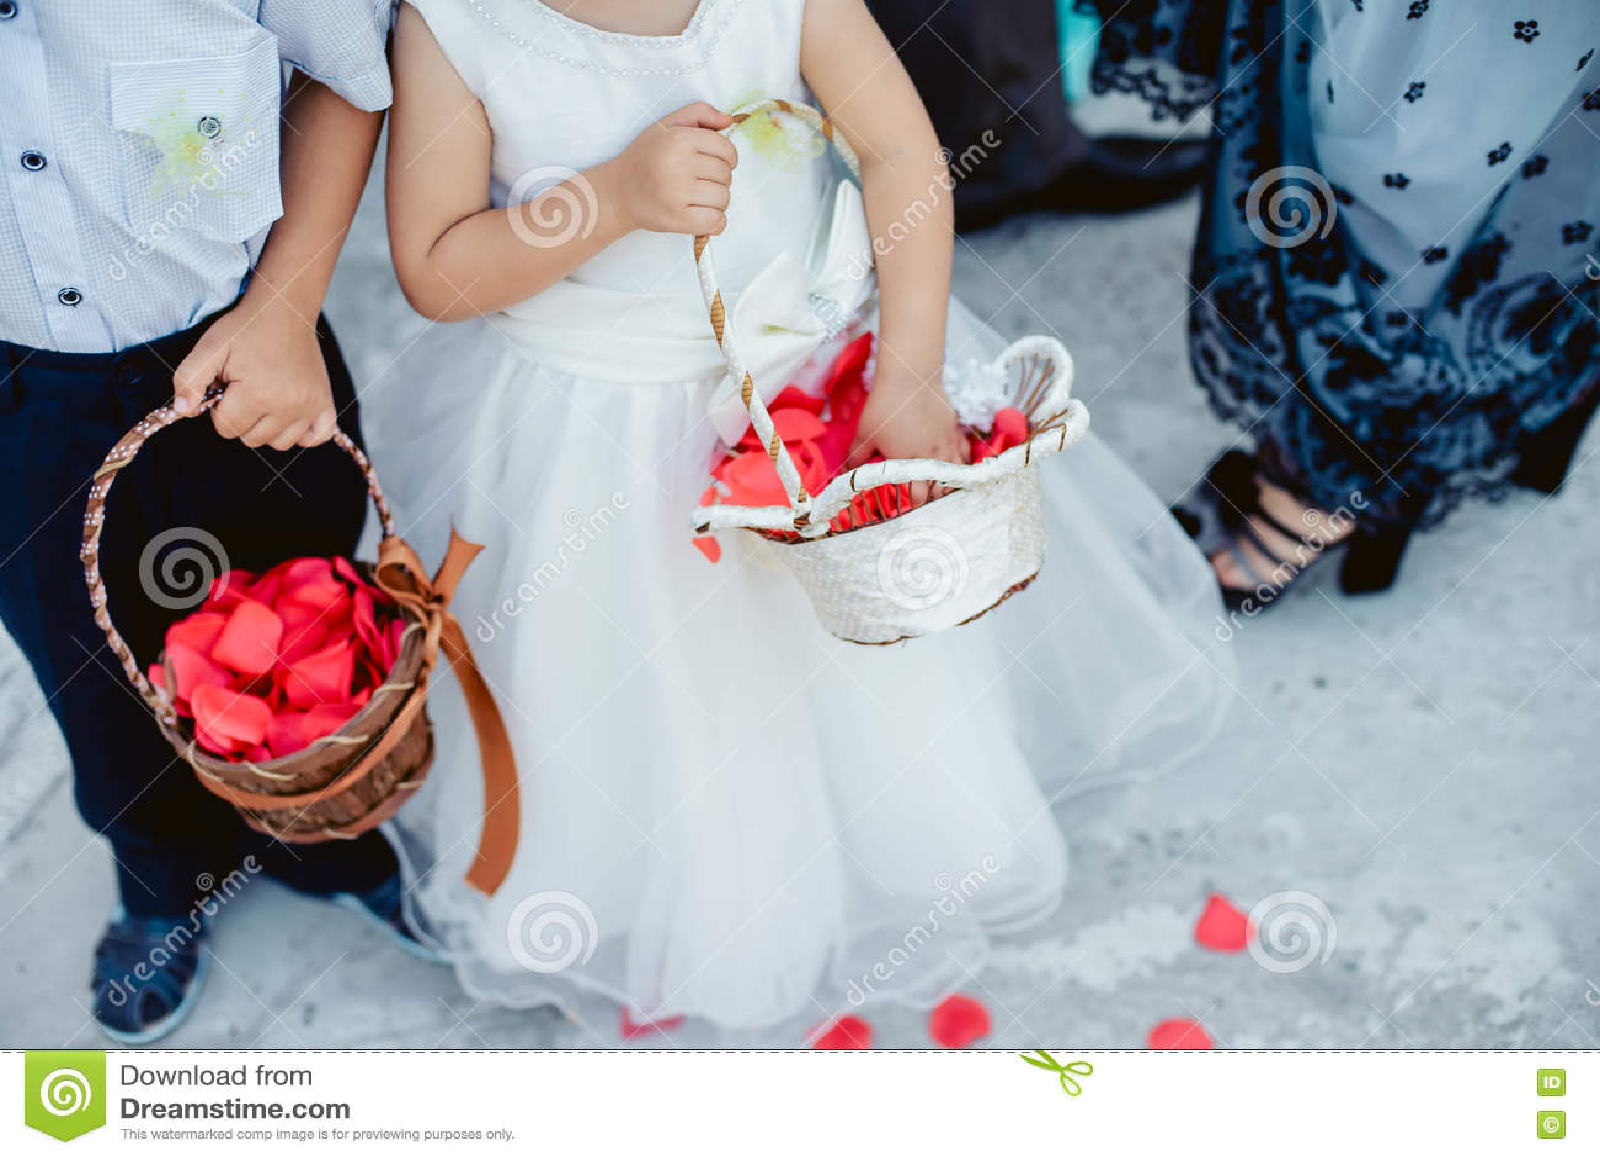 Белые лепестки роз на свадьбу фото